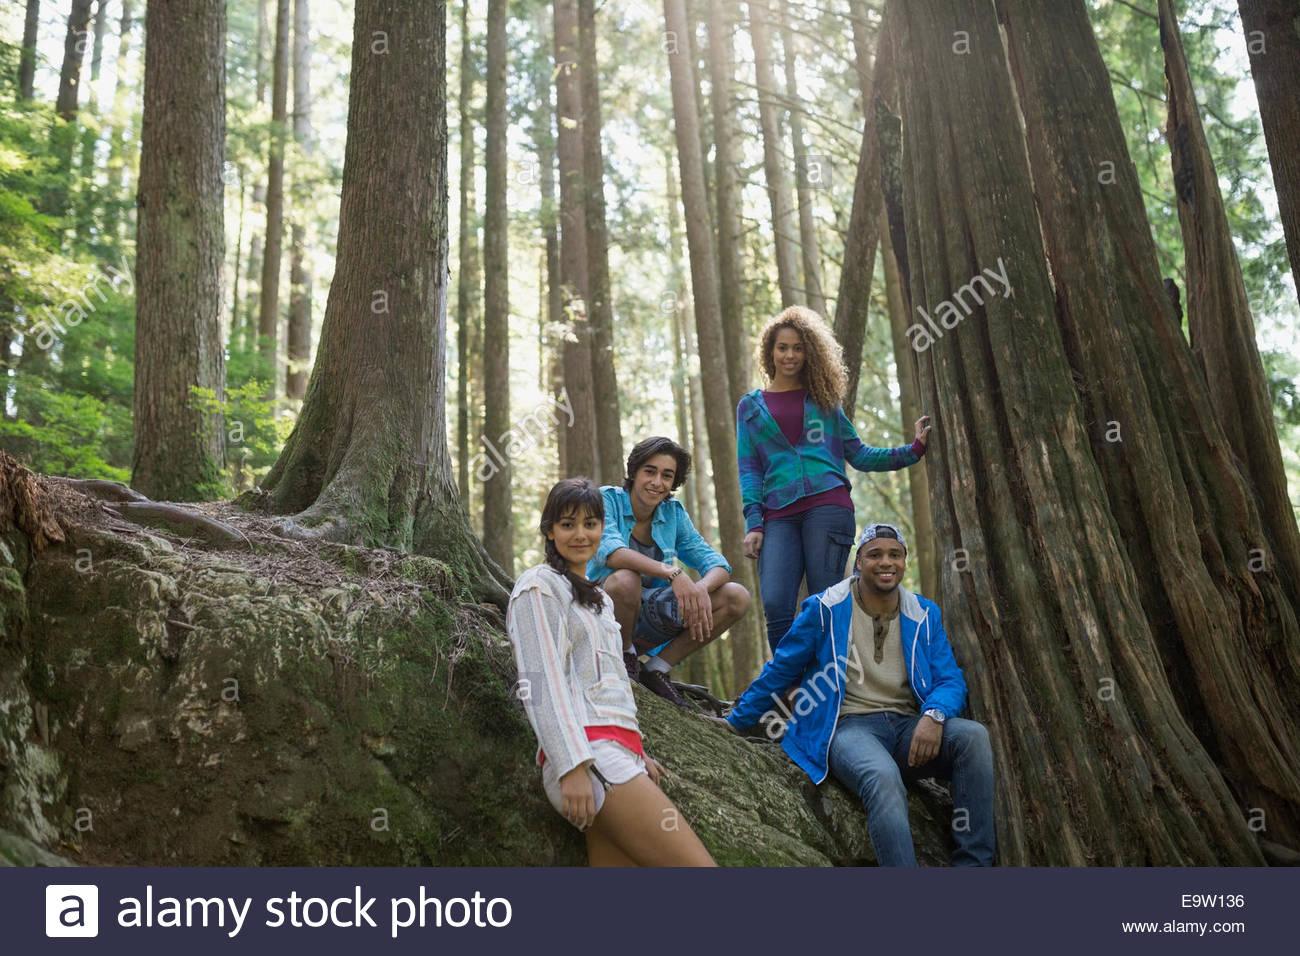 Portrait of friends below trees in woods - Stock Image